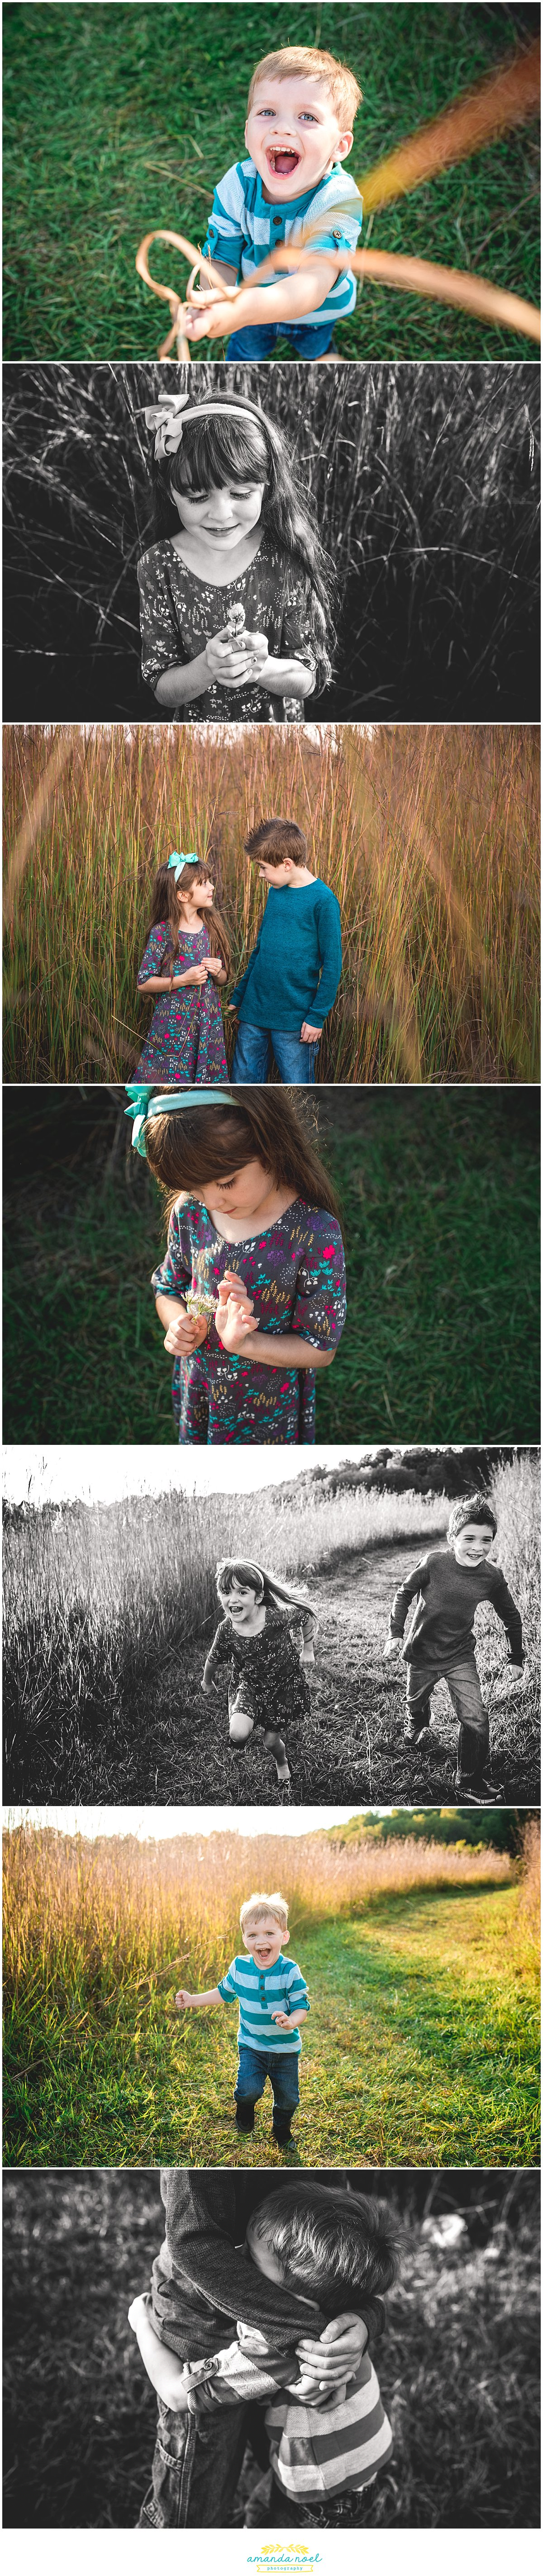 Central Ohio Family Photographer | Amanda Noel Photography